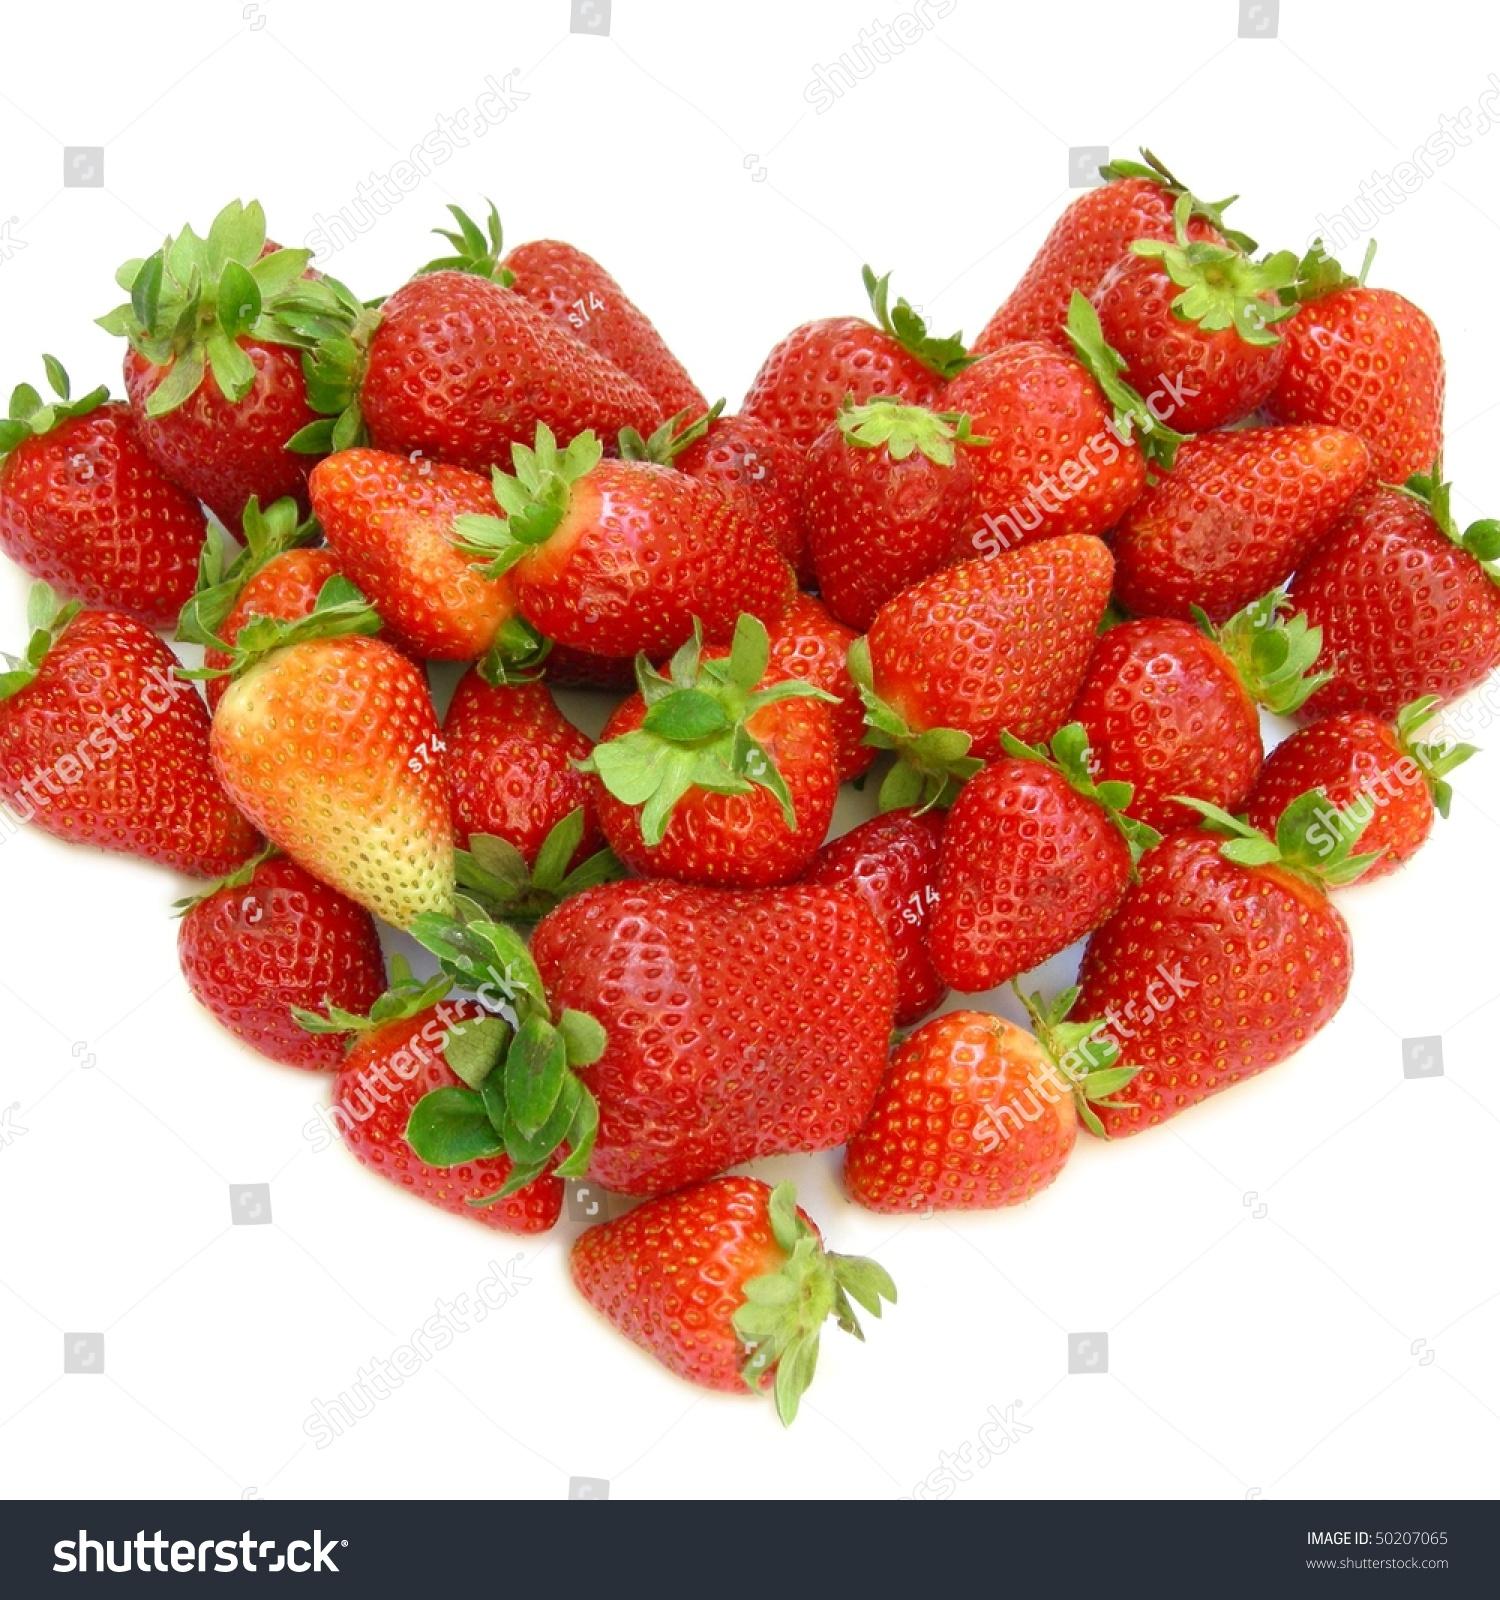 Red strawberry heart symbol love passion stock photo 50207065 red strawberry heart symbol of love and passion biocorpaavc